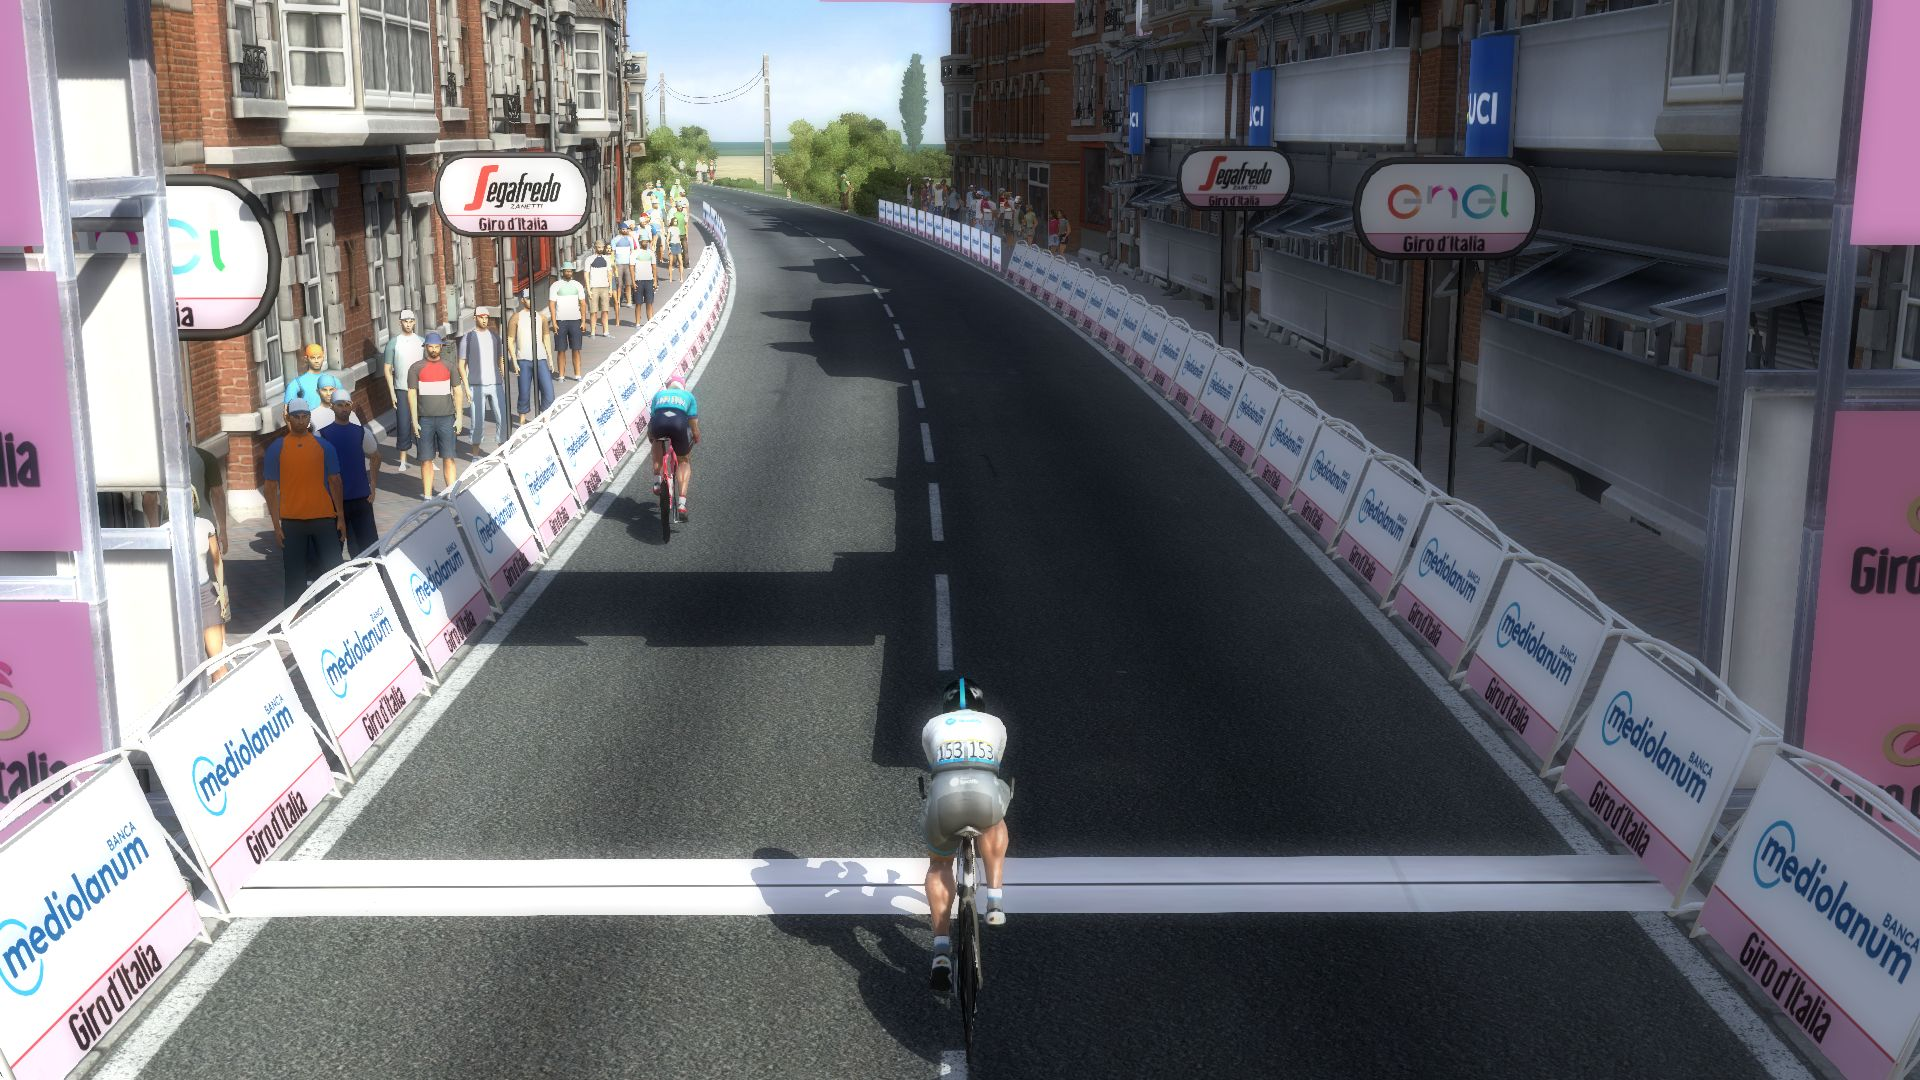 pcmdaily.com/images/mg/2020/Reports/GTM/Giro/S14/mg20_giro_s14_09.jpg